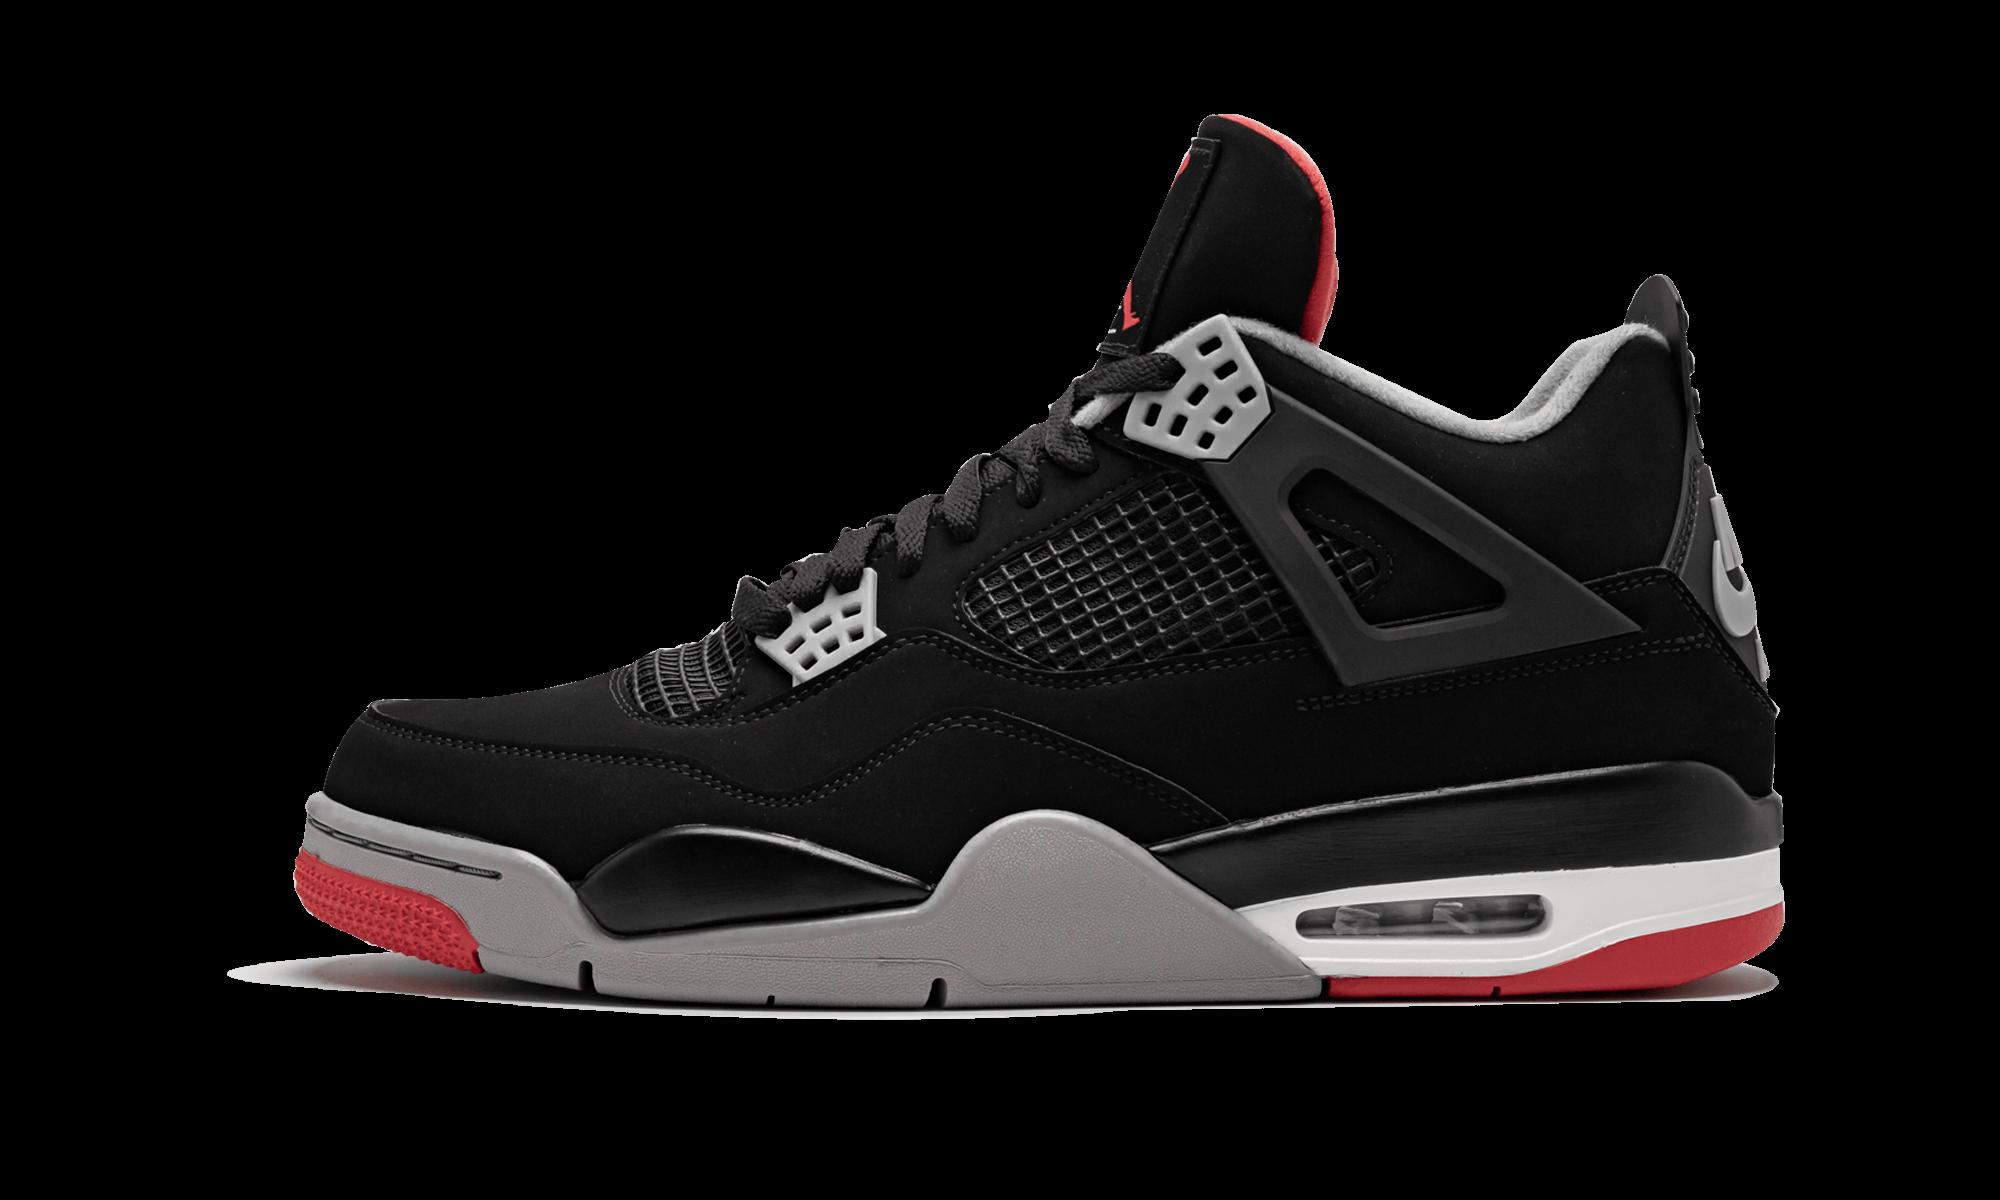 Air Jordan 4 Retro Bred 2019 Release 308497 060 2019 Air Jordans Air Jordans Retro Air Jordan 4 Bred